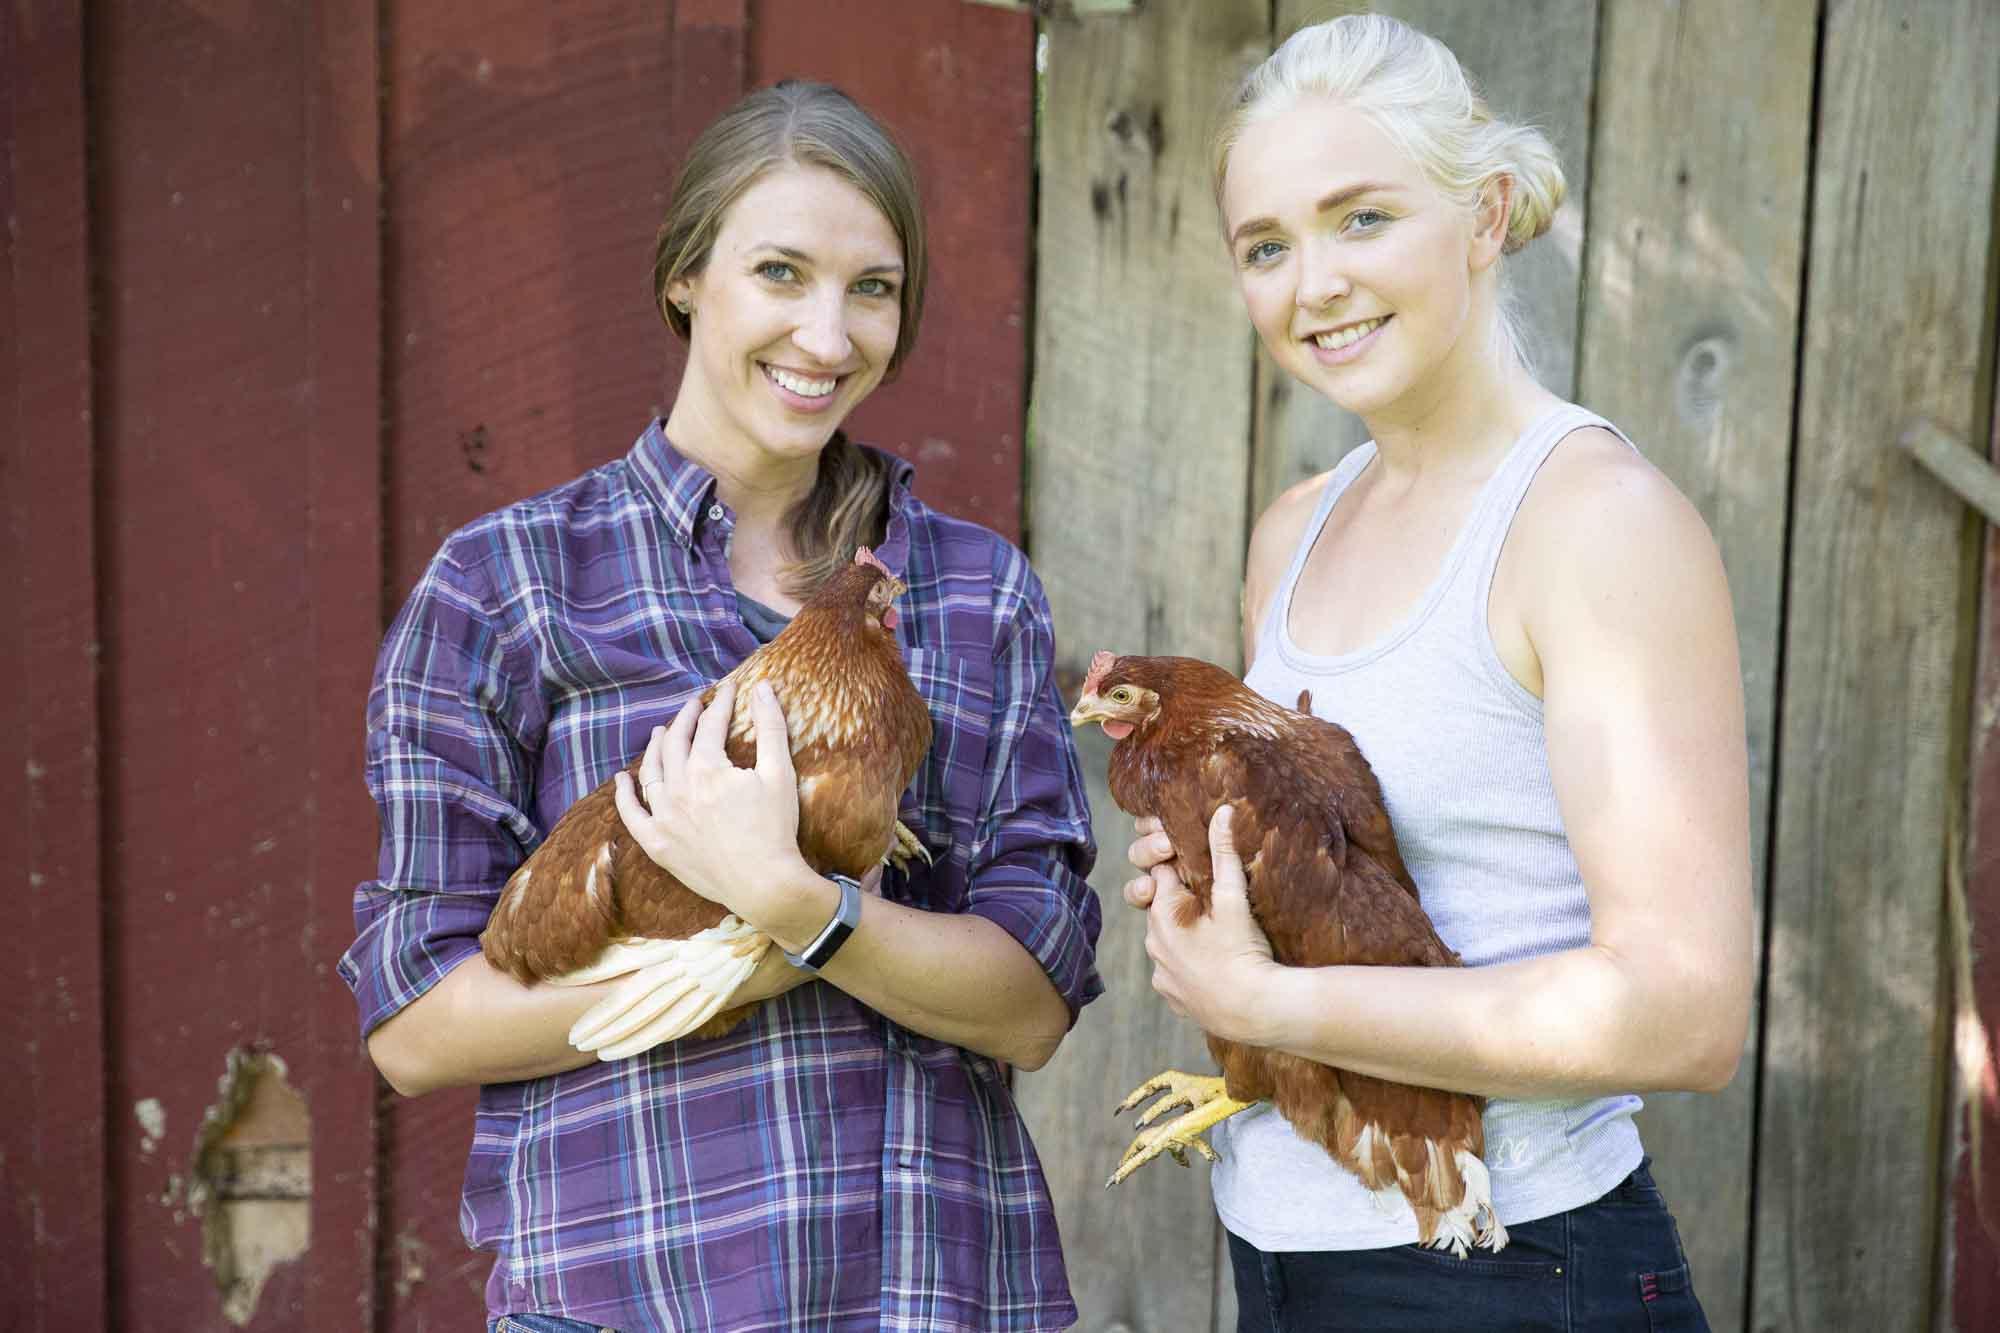 Sarah & Pam hold chickens, the cuddliest feathered farm animal